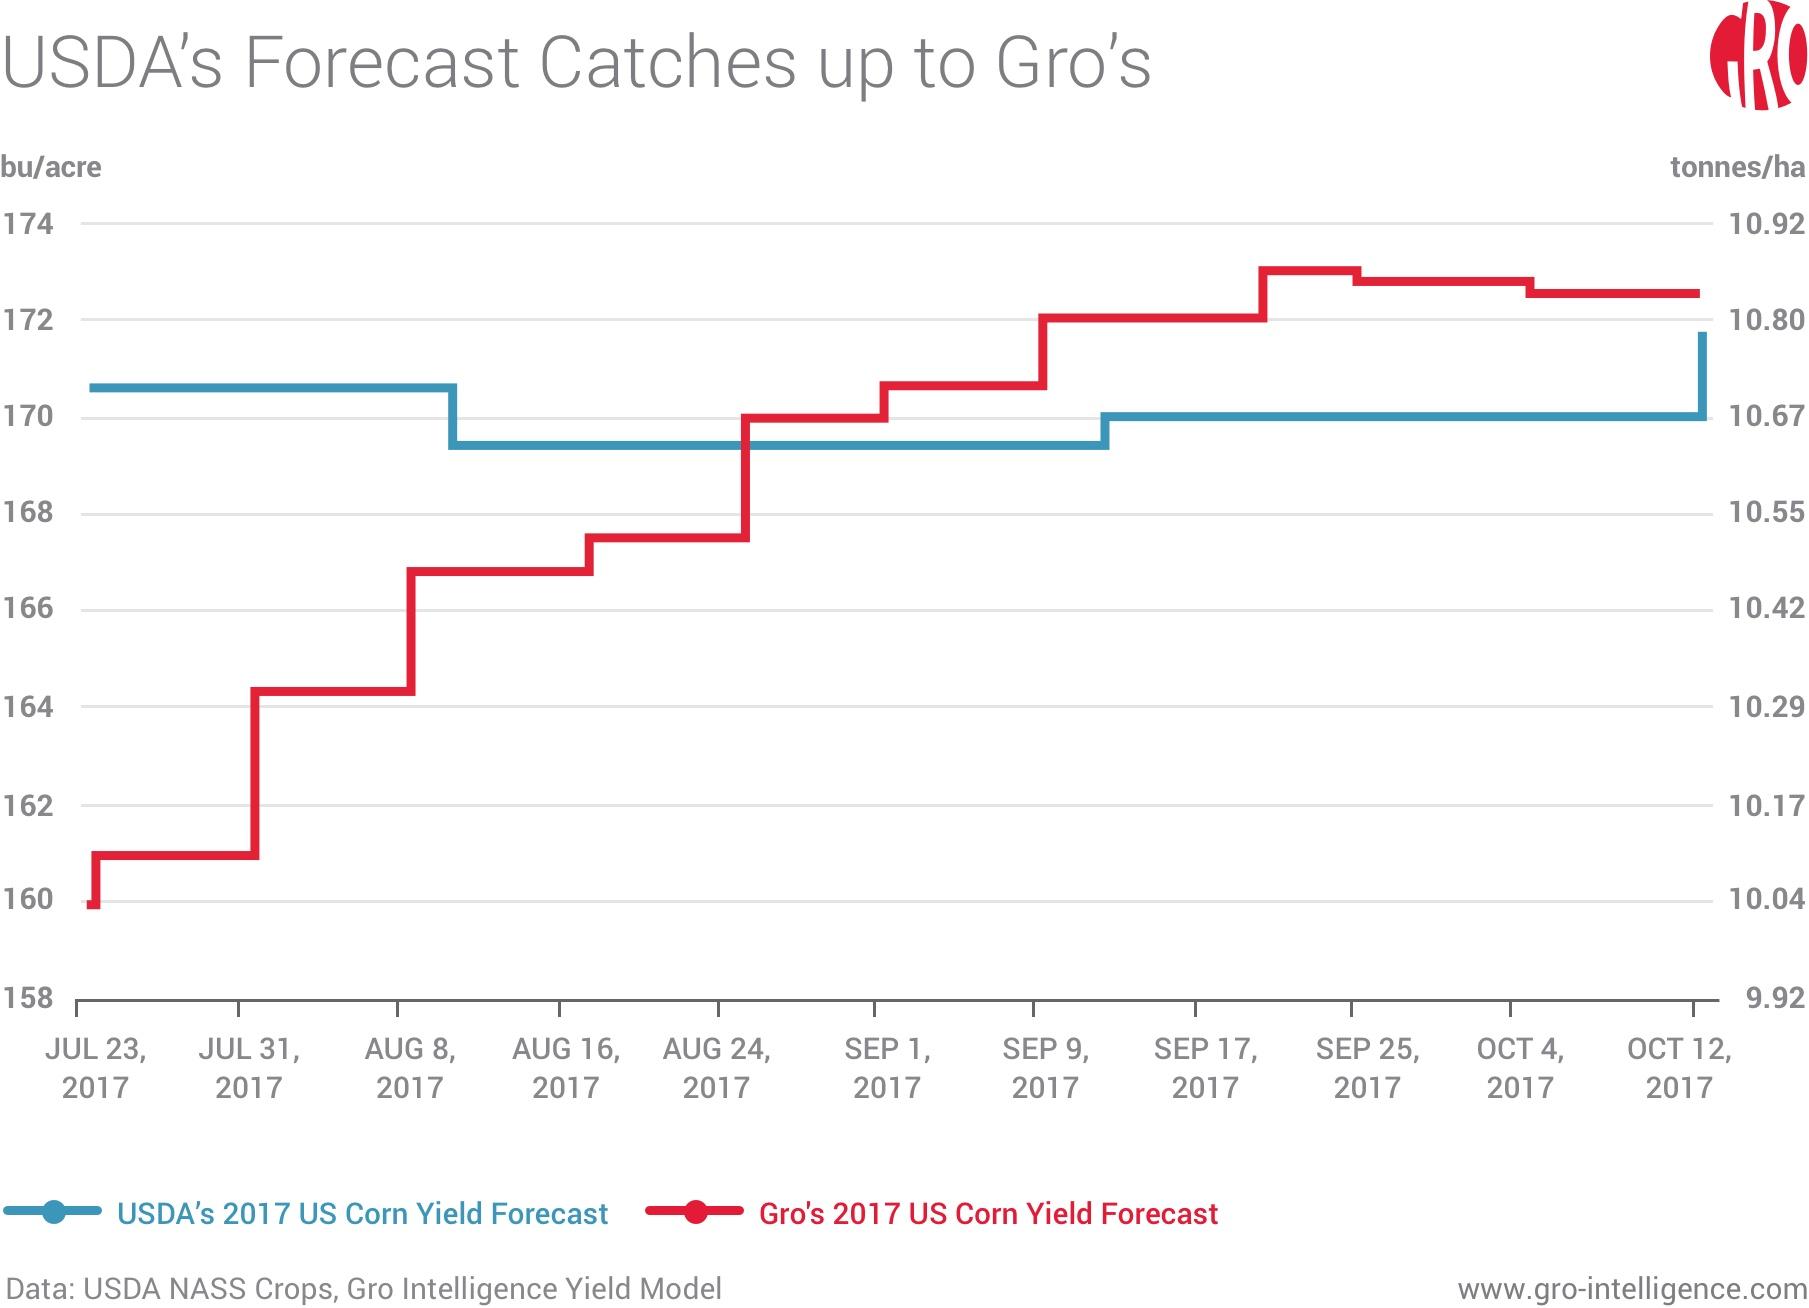 USDA's Forecast Catches up to Gro's